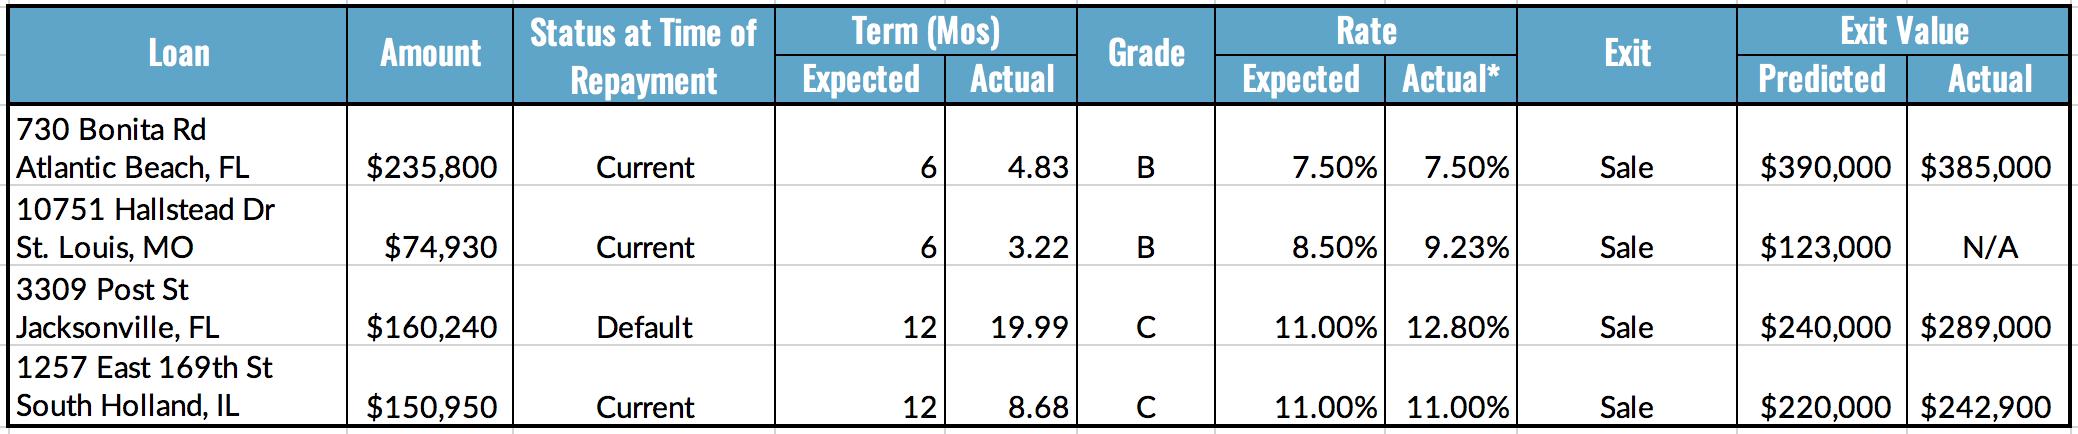 Loan Repayment Table, 6.21-27